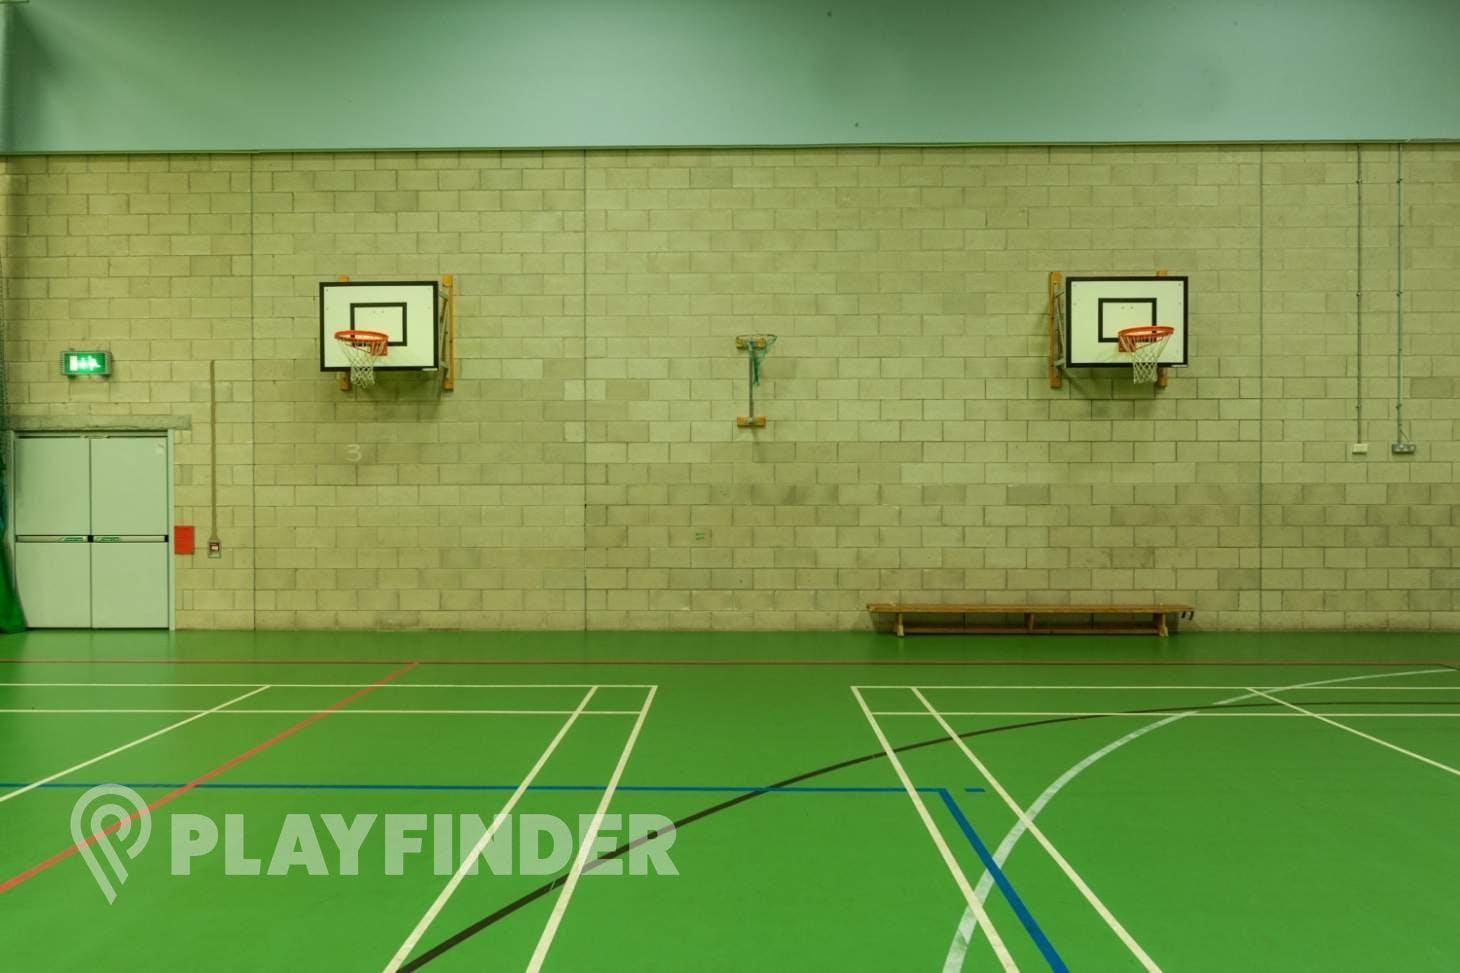 Chorlton High School Indoor netball court